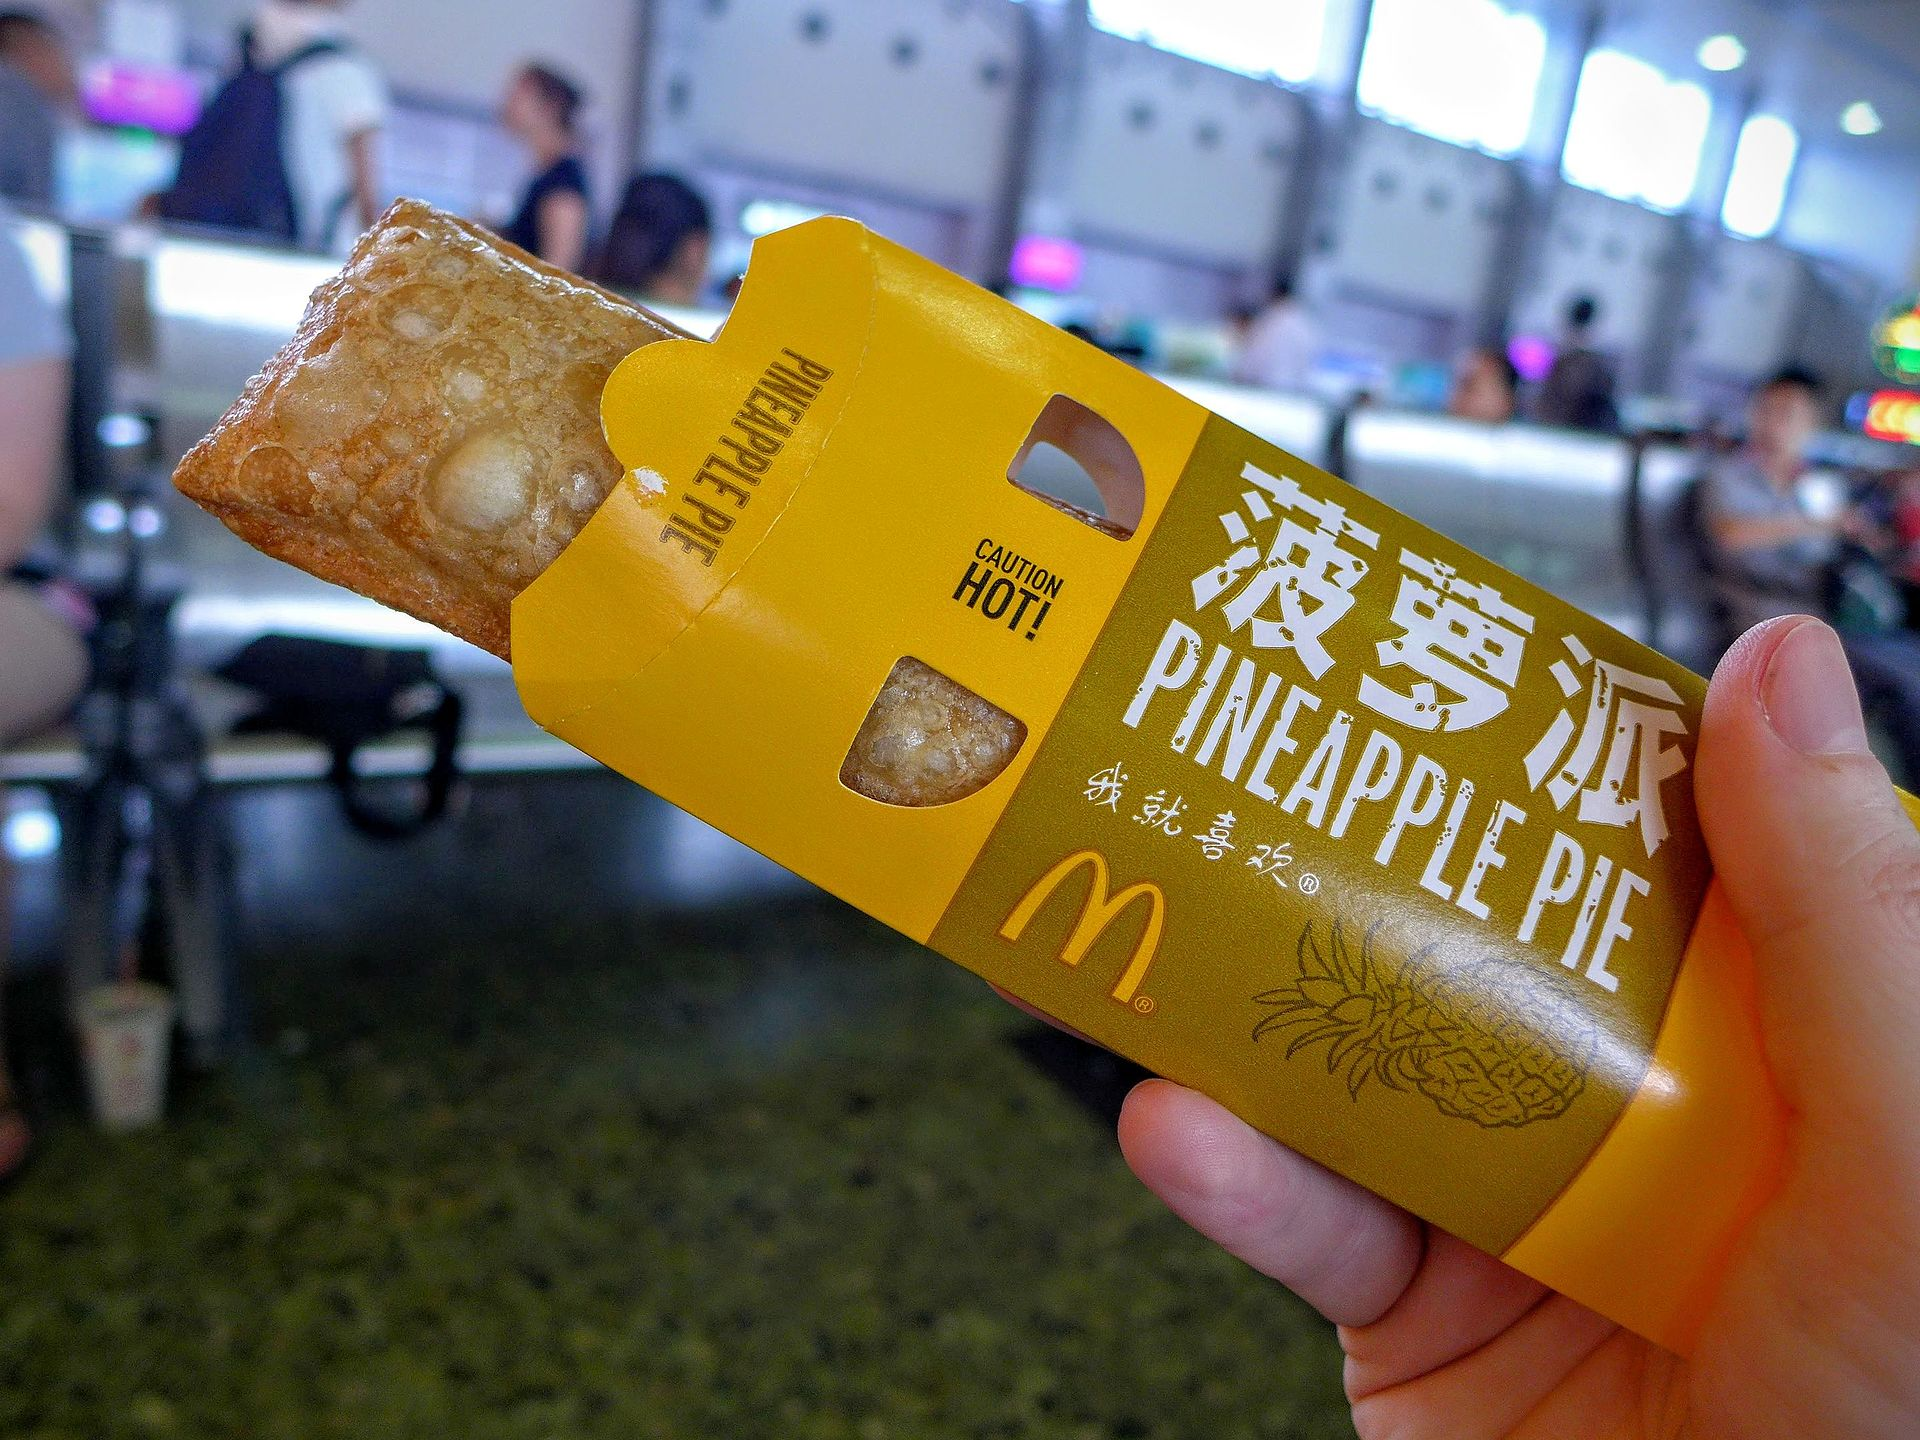 Fried pineapple pie mcdonalds